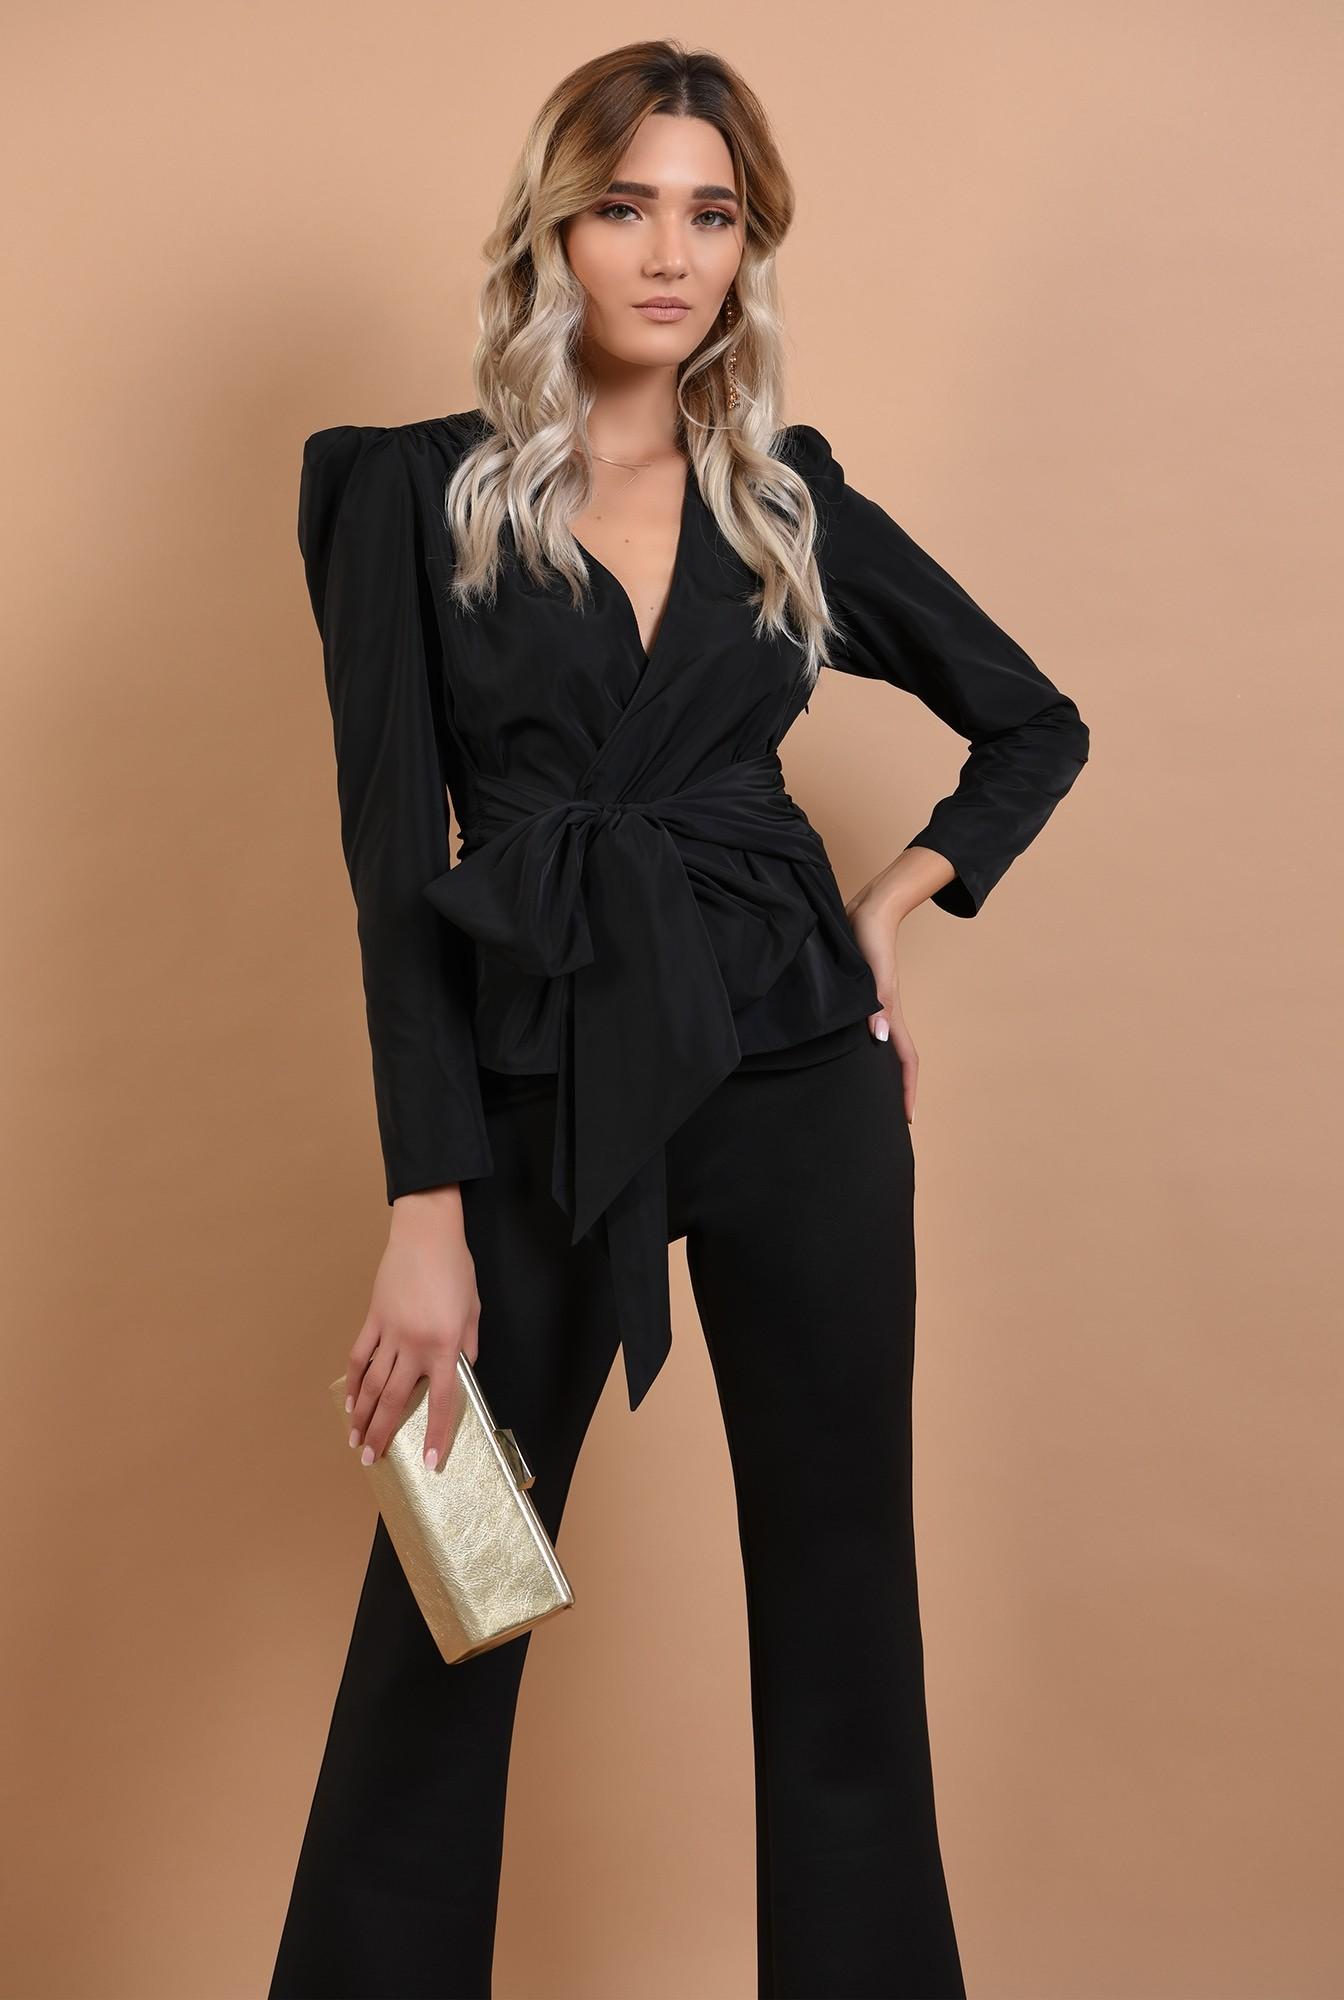 0 - bluza eleganta, neagra, cambrata, cu funda la talie, cret la umeri